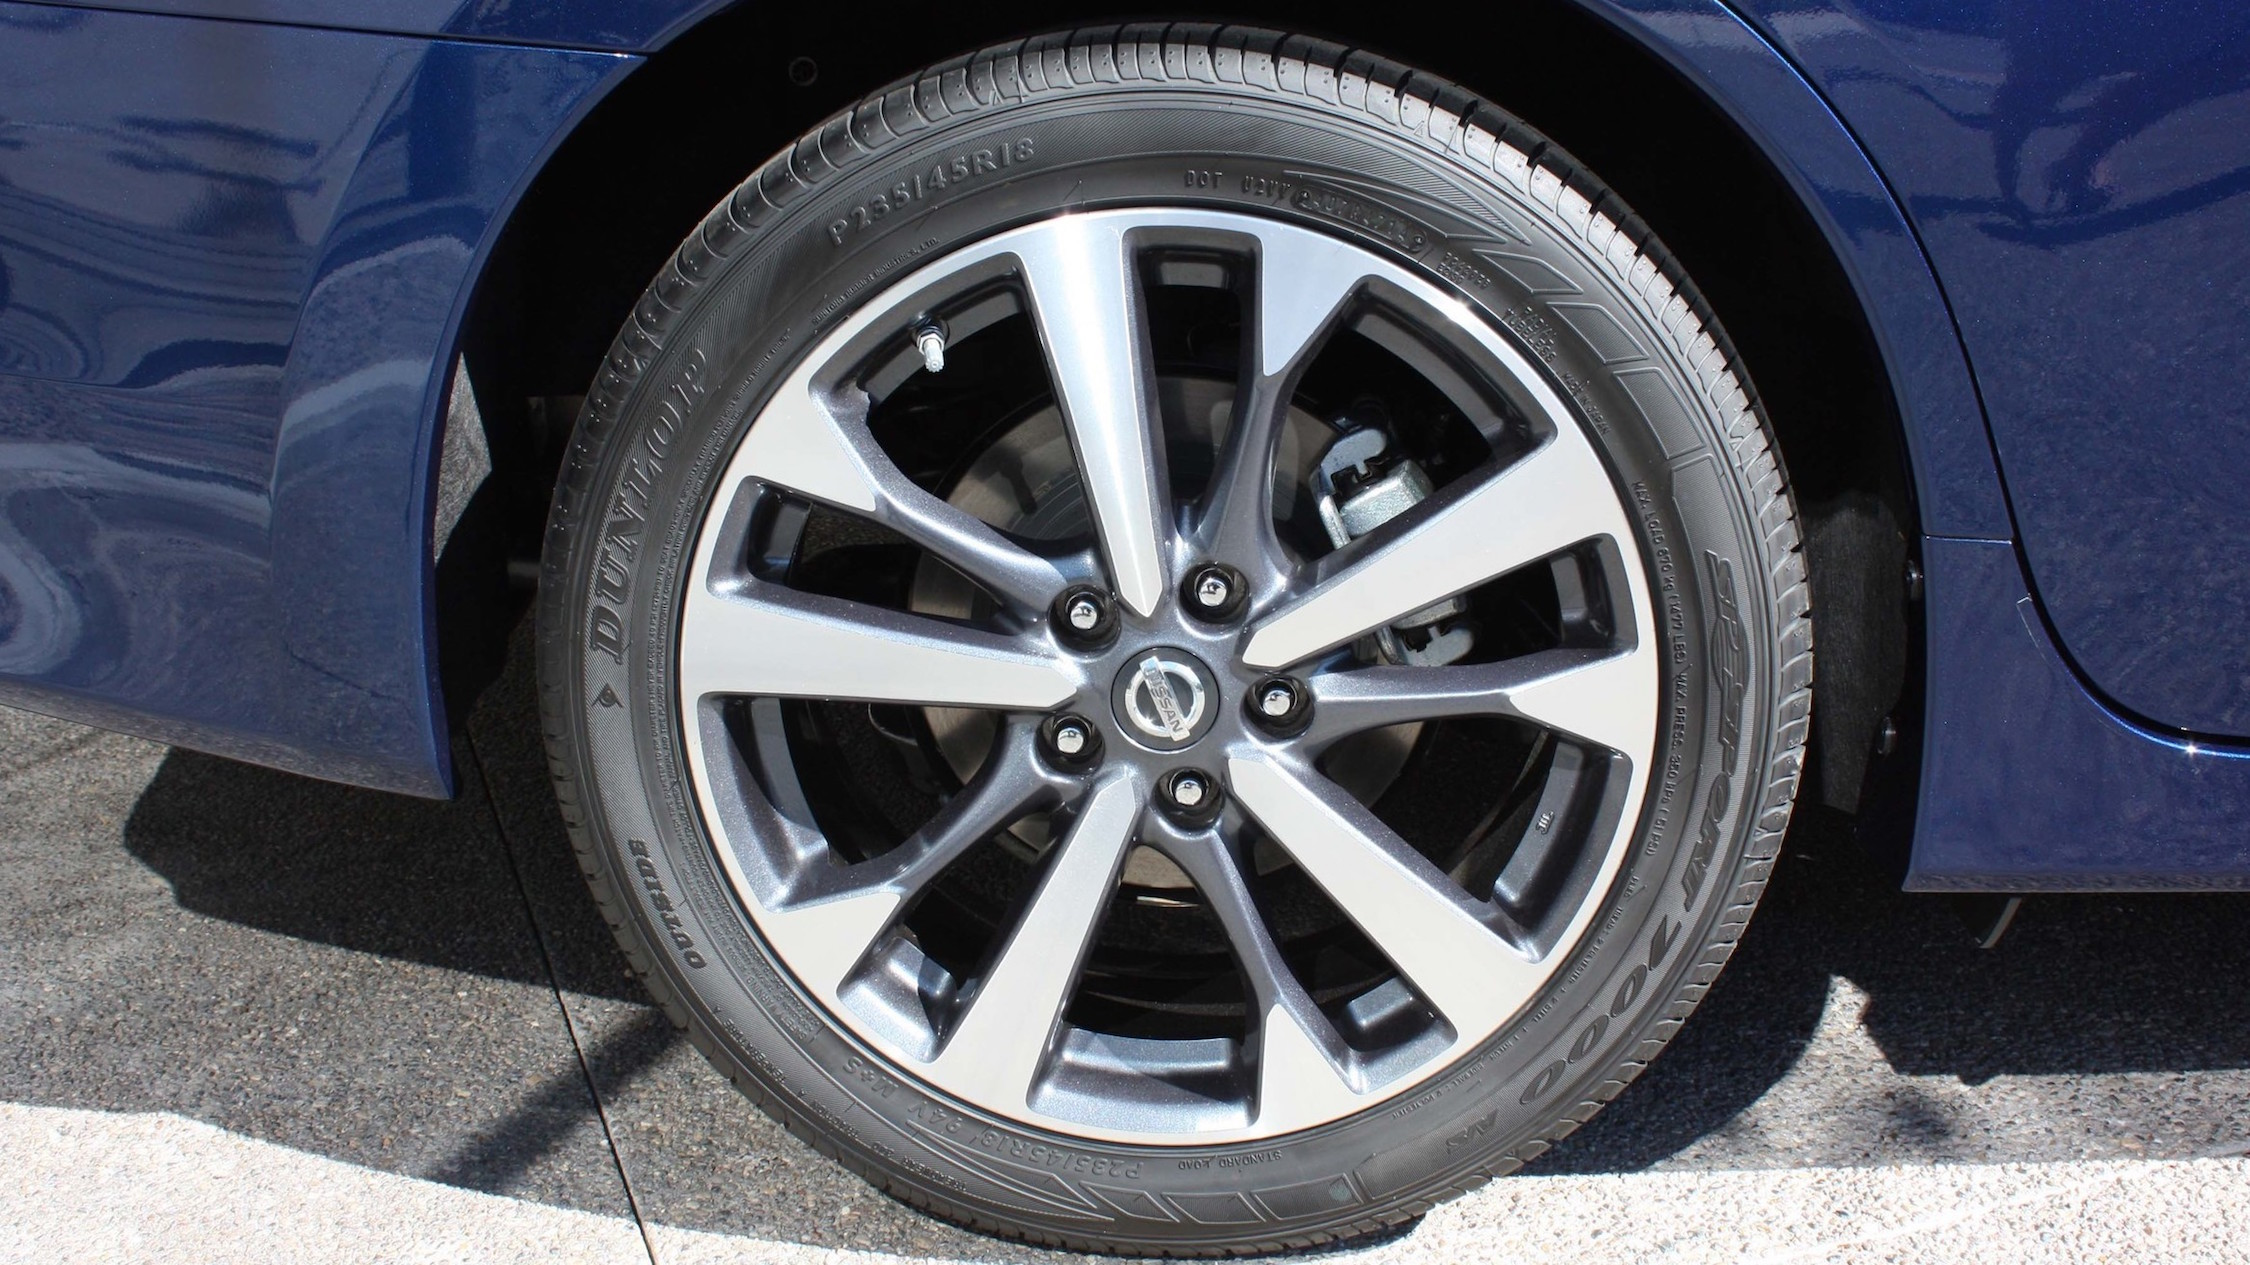 2016 Nissan Altima Exterior Wheel